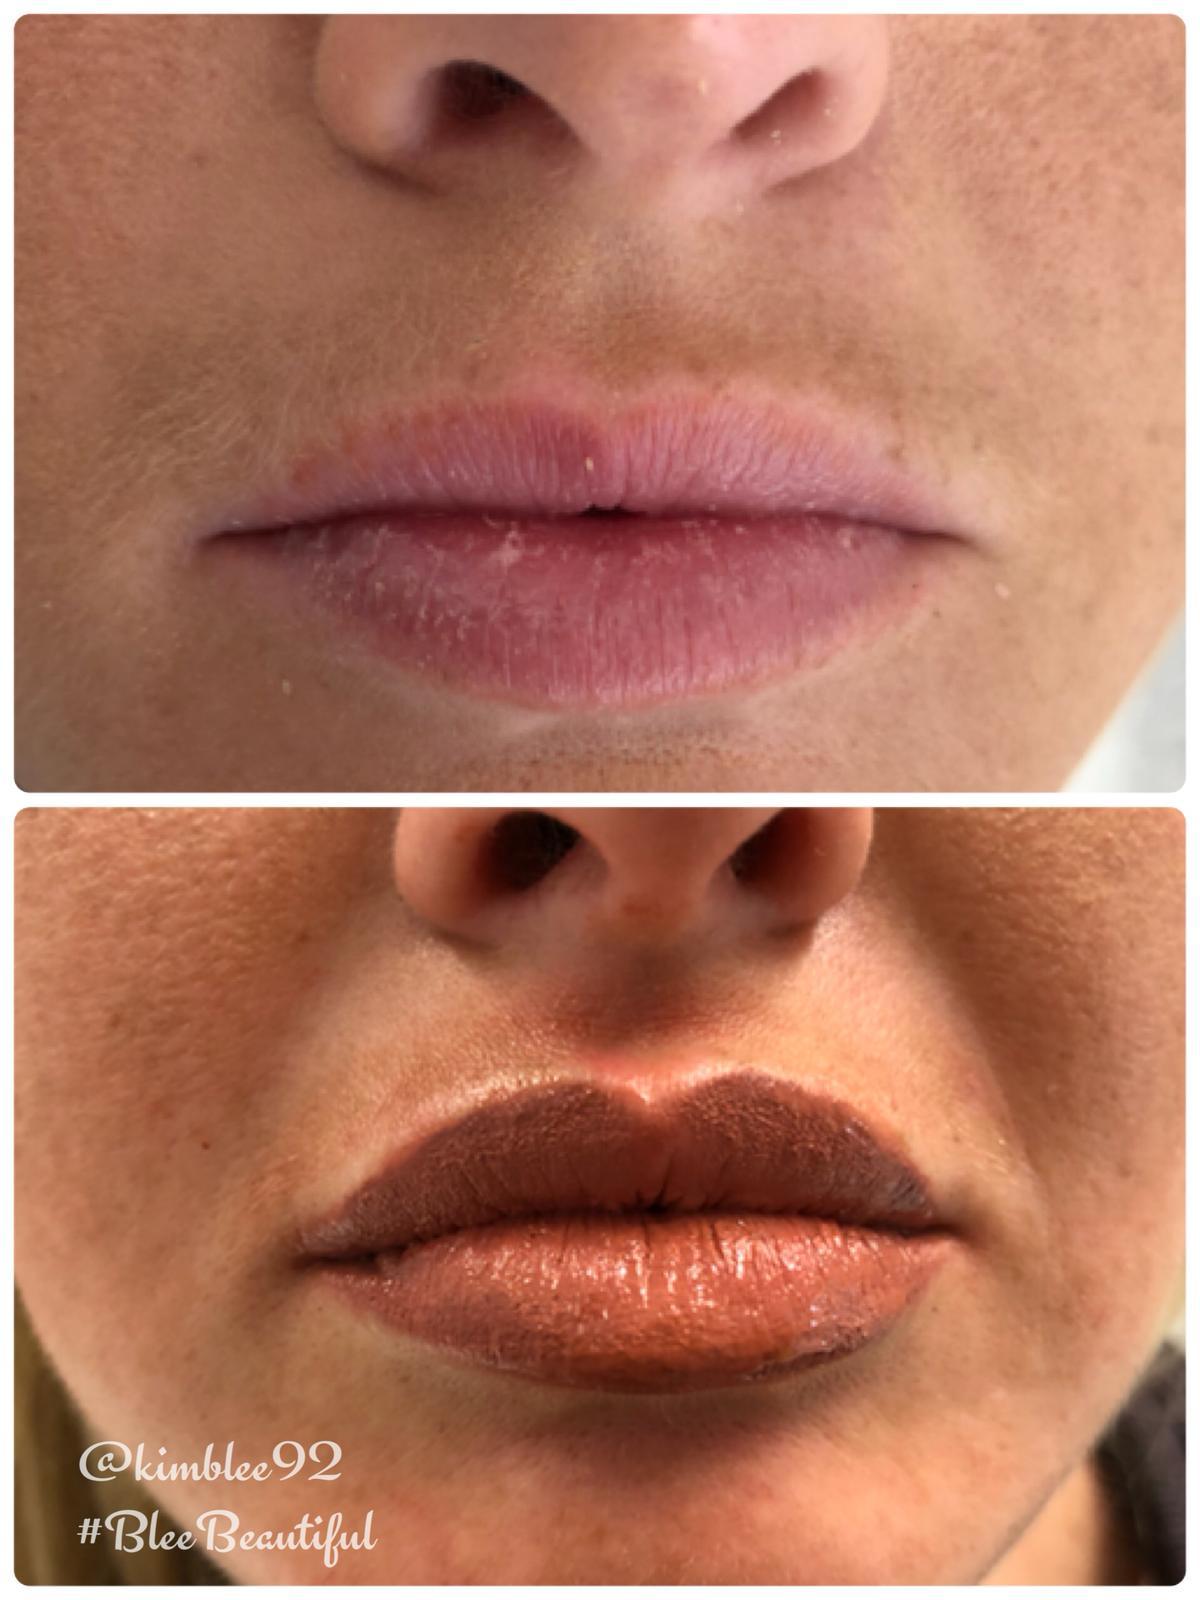 Venus-Beauty-Hair-Salon-Devon-Tavistock-Kim-Pope-Microblading-Semi-Permanent-Make-Up-Lip-Liner-Blush.JPG